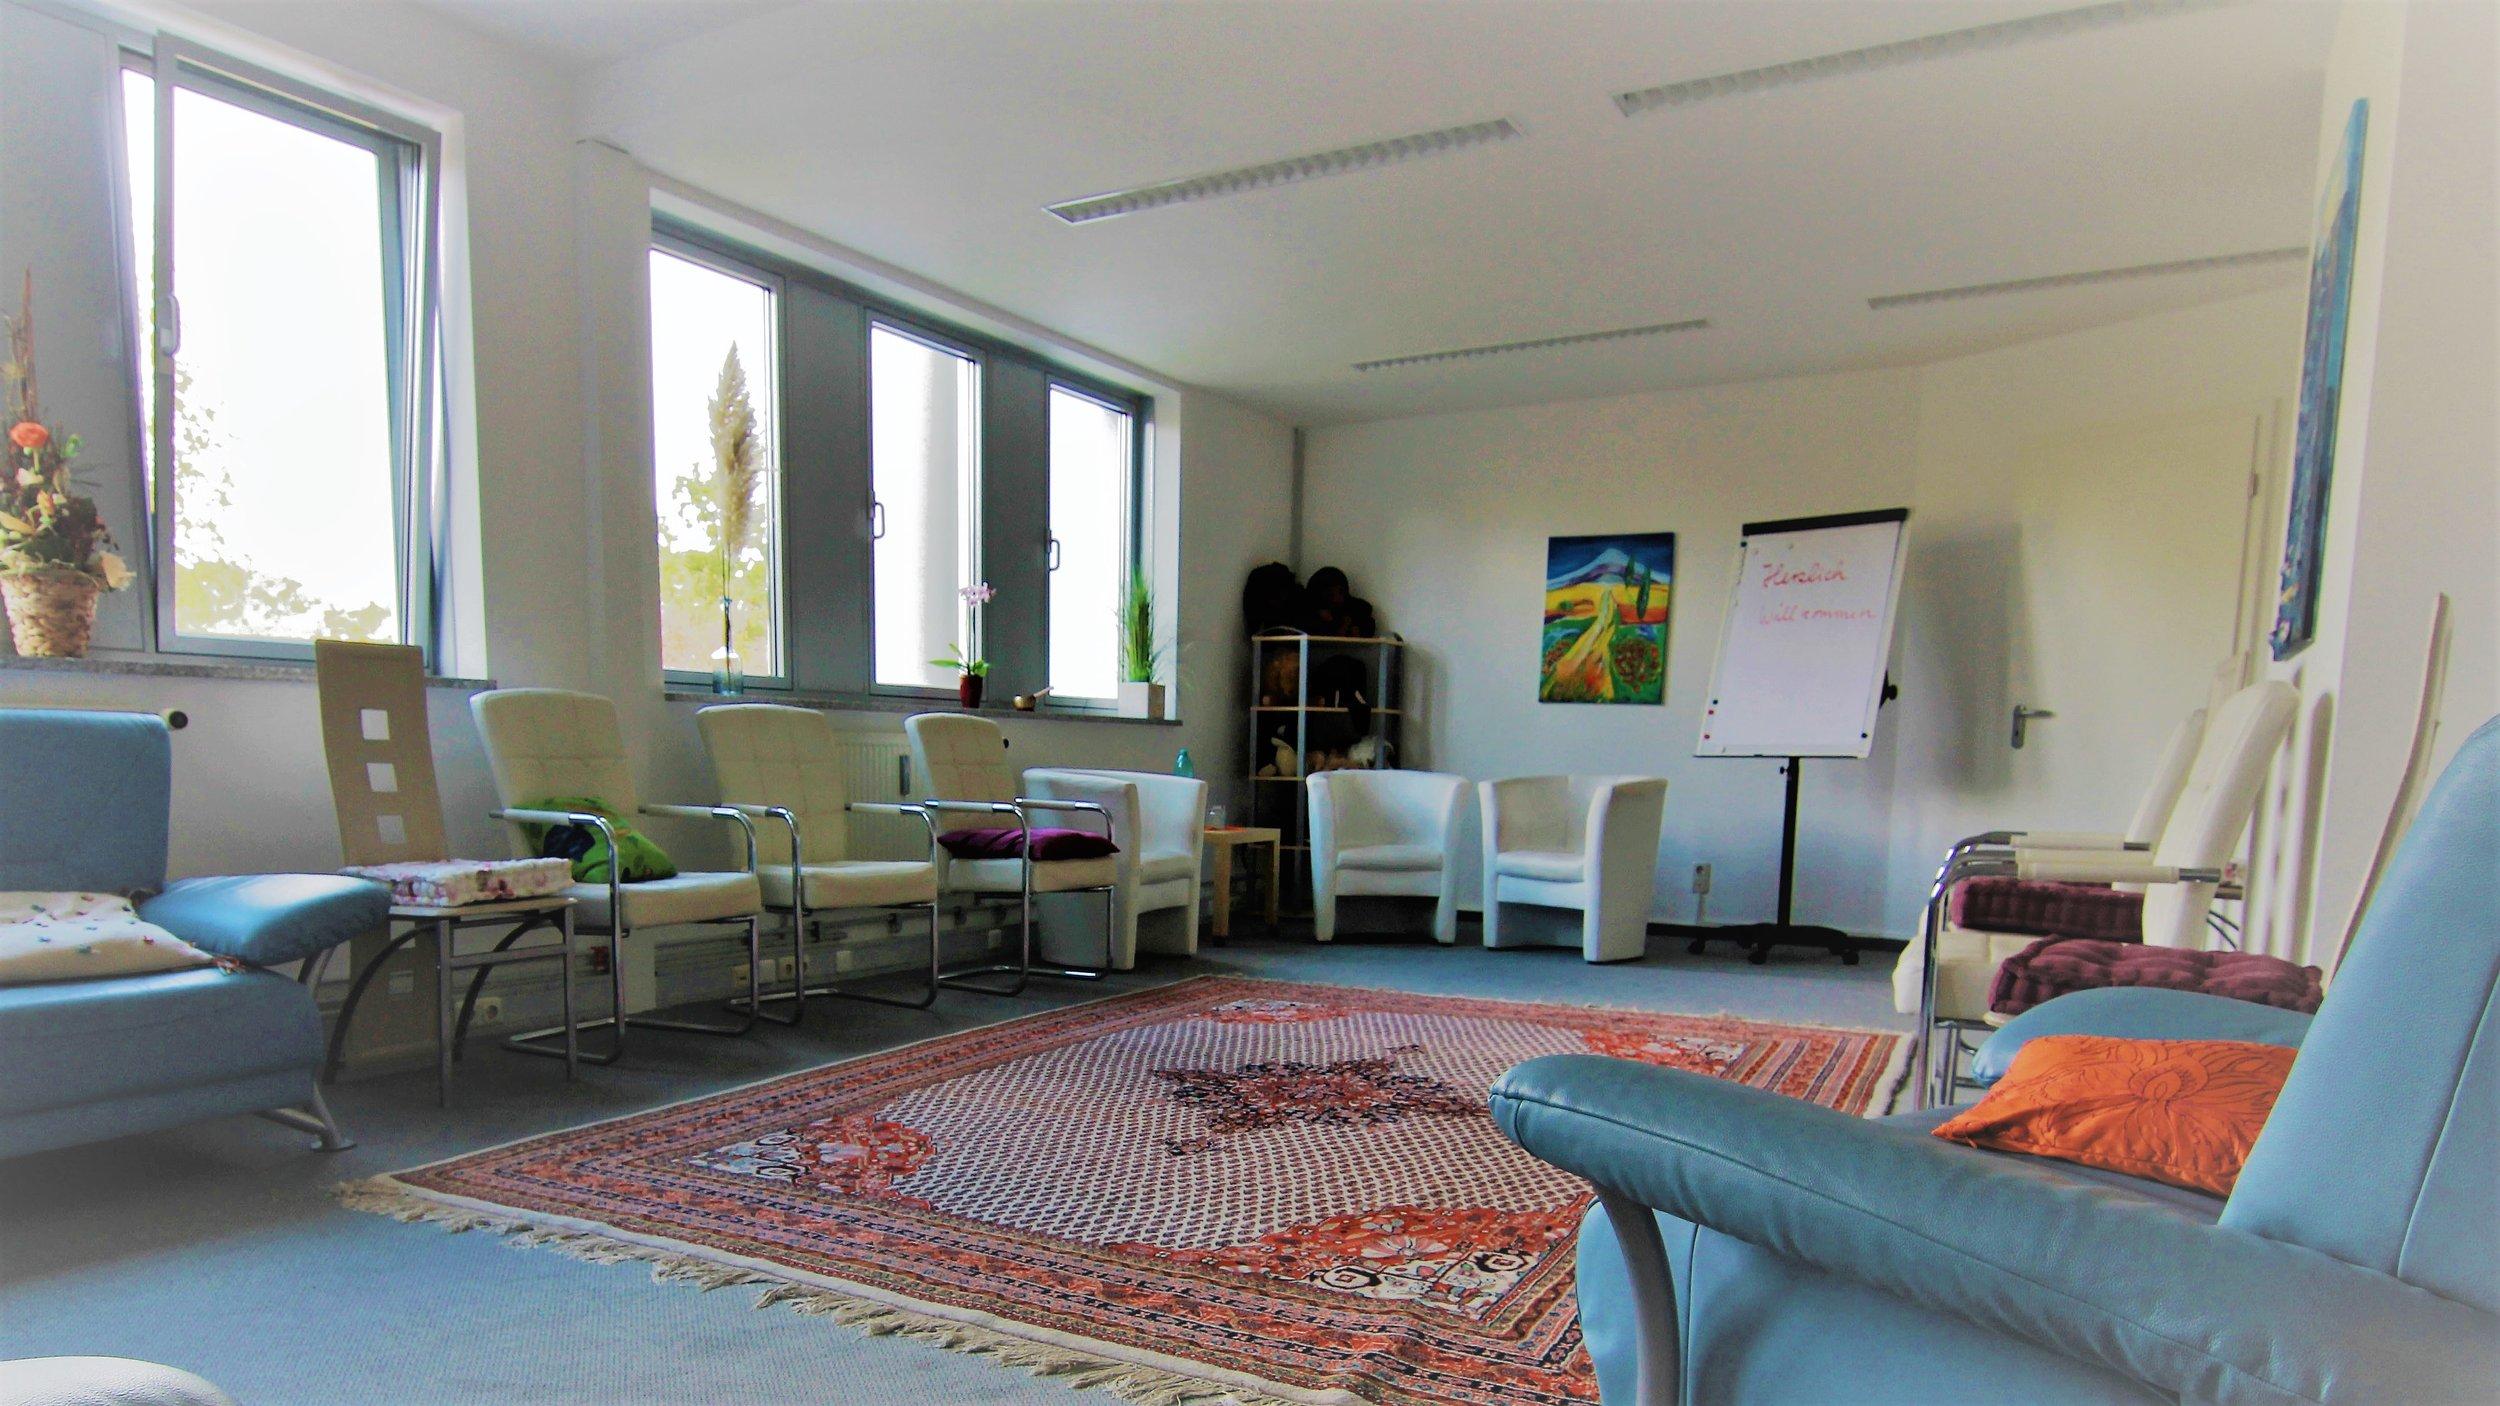 Seminarraum in Regensburg